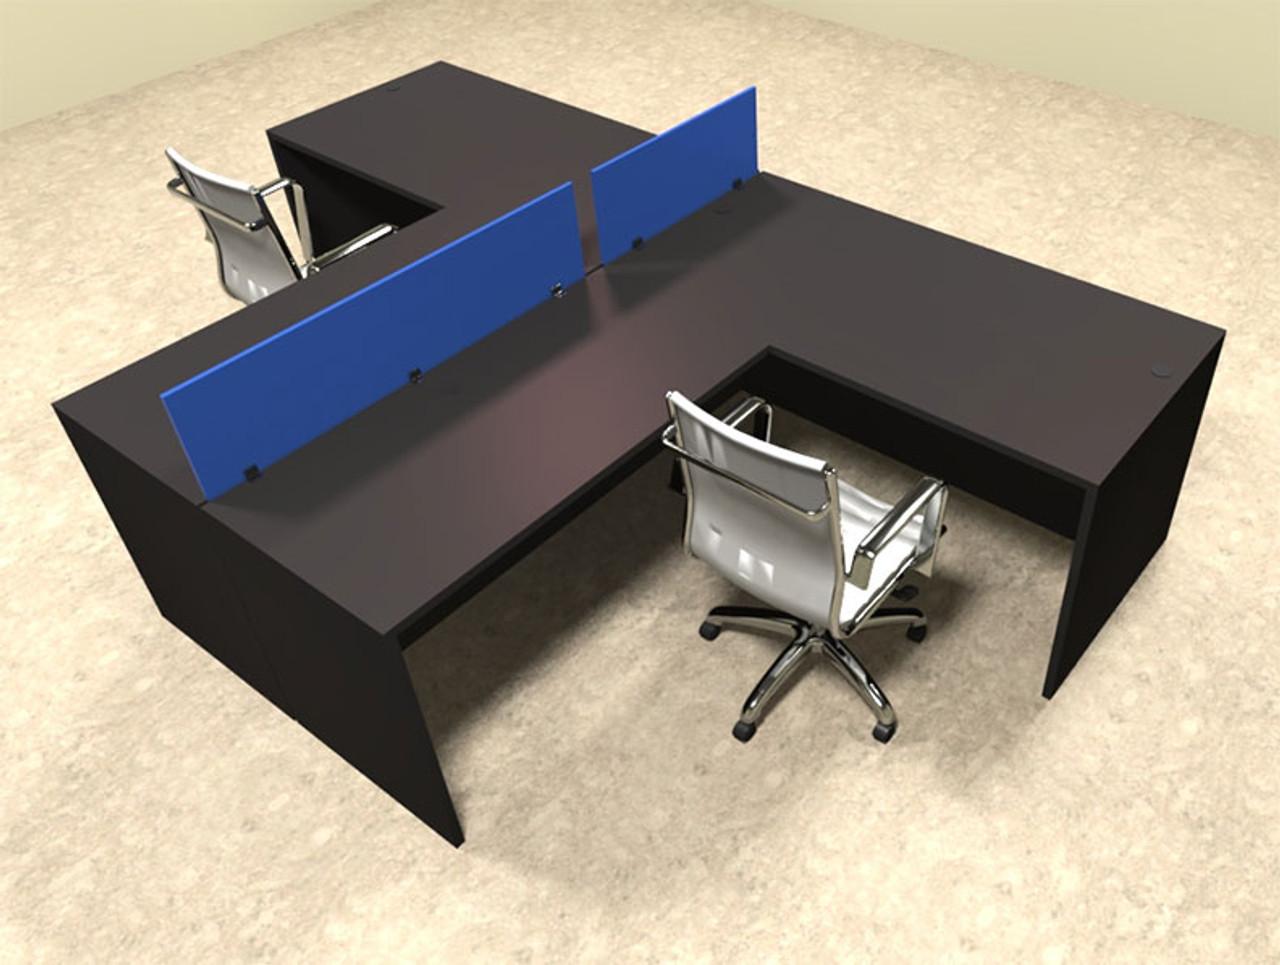 Two Person Blue Divider Office Workstation Desk Set, #OT-SUL-SPB44